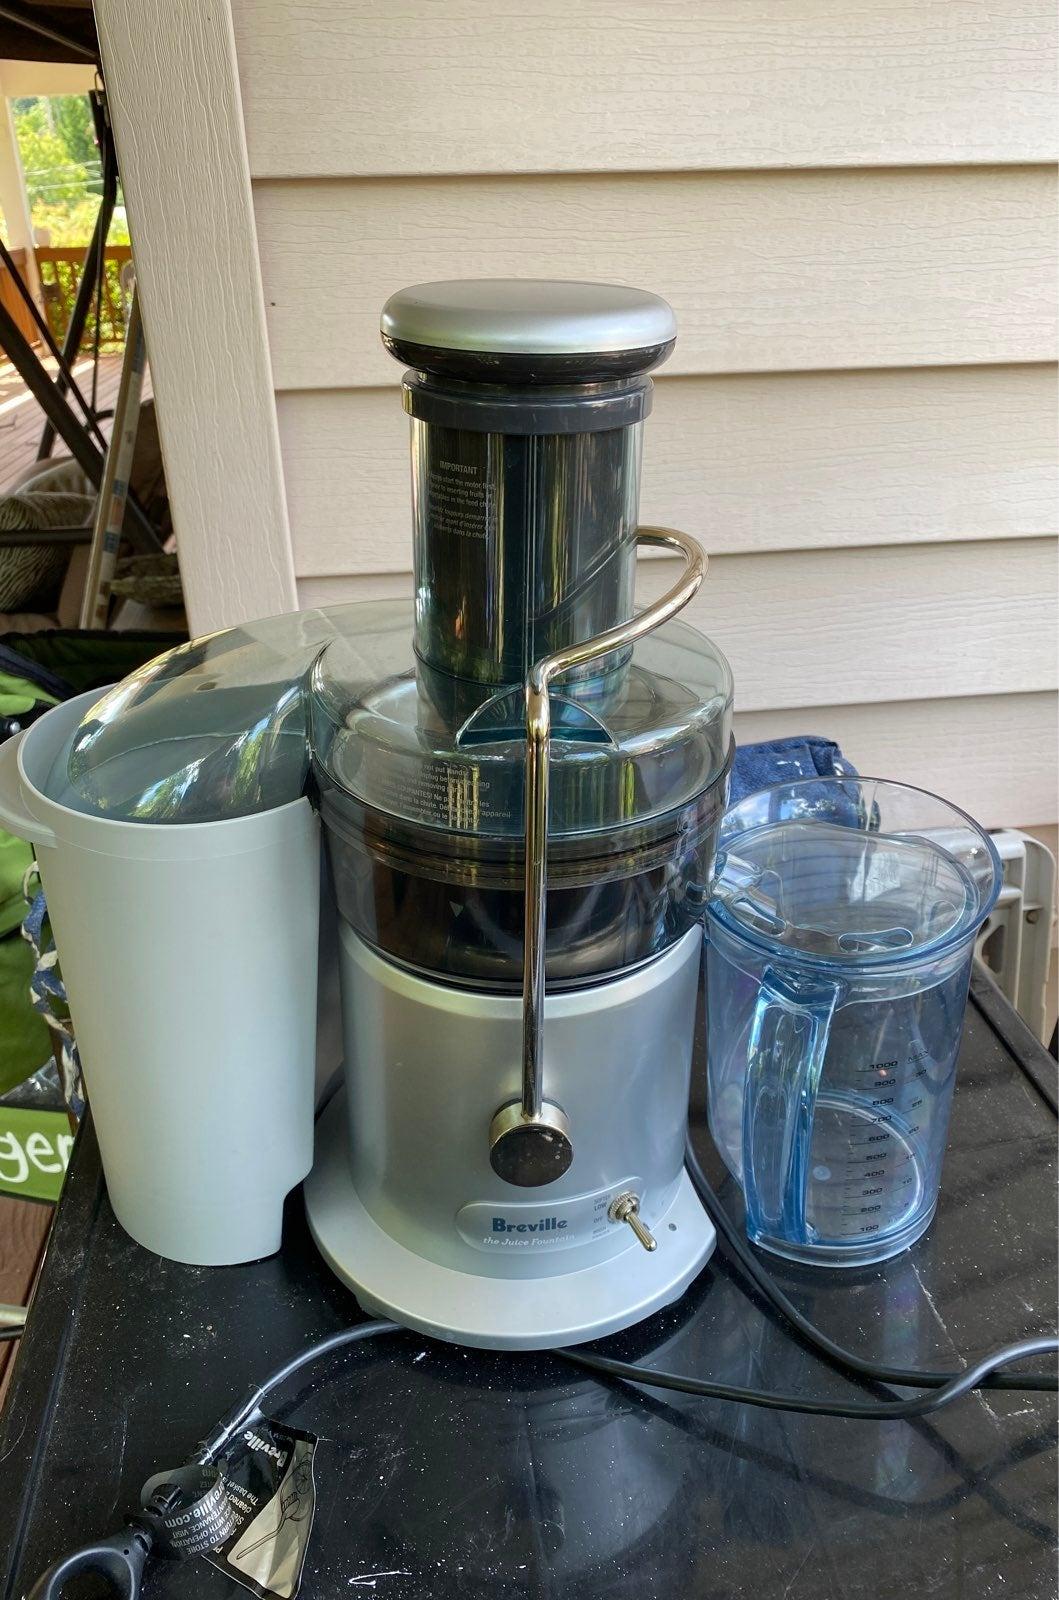 Breville Juicer juice fountain je98xl